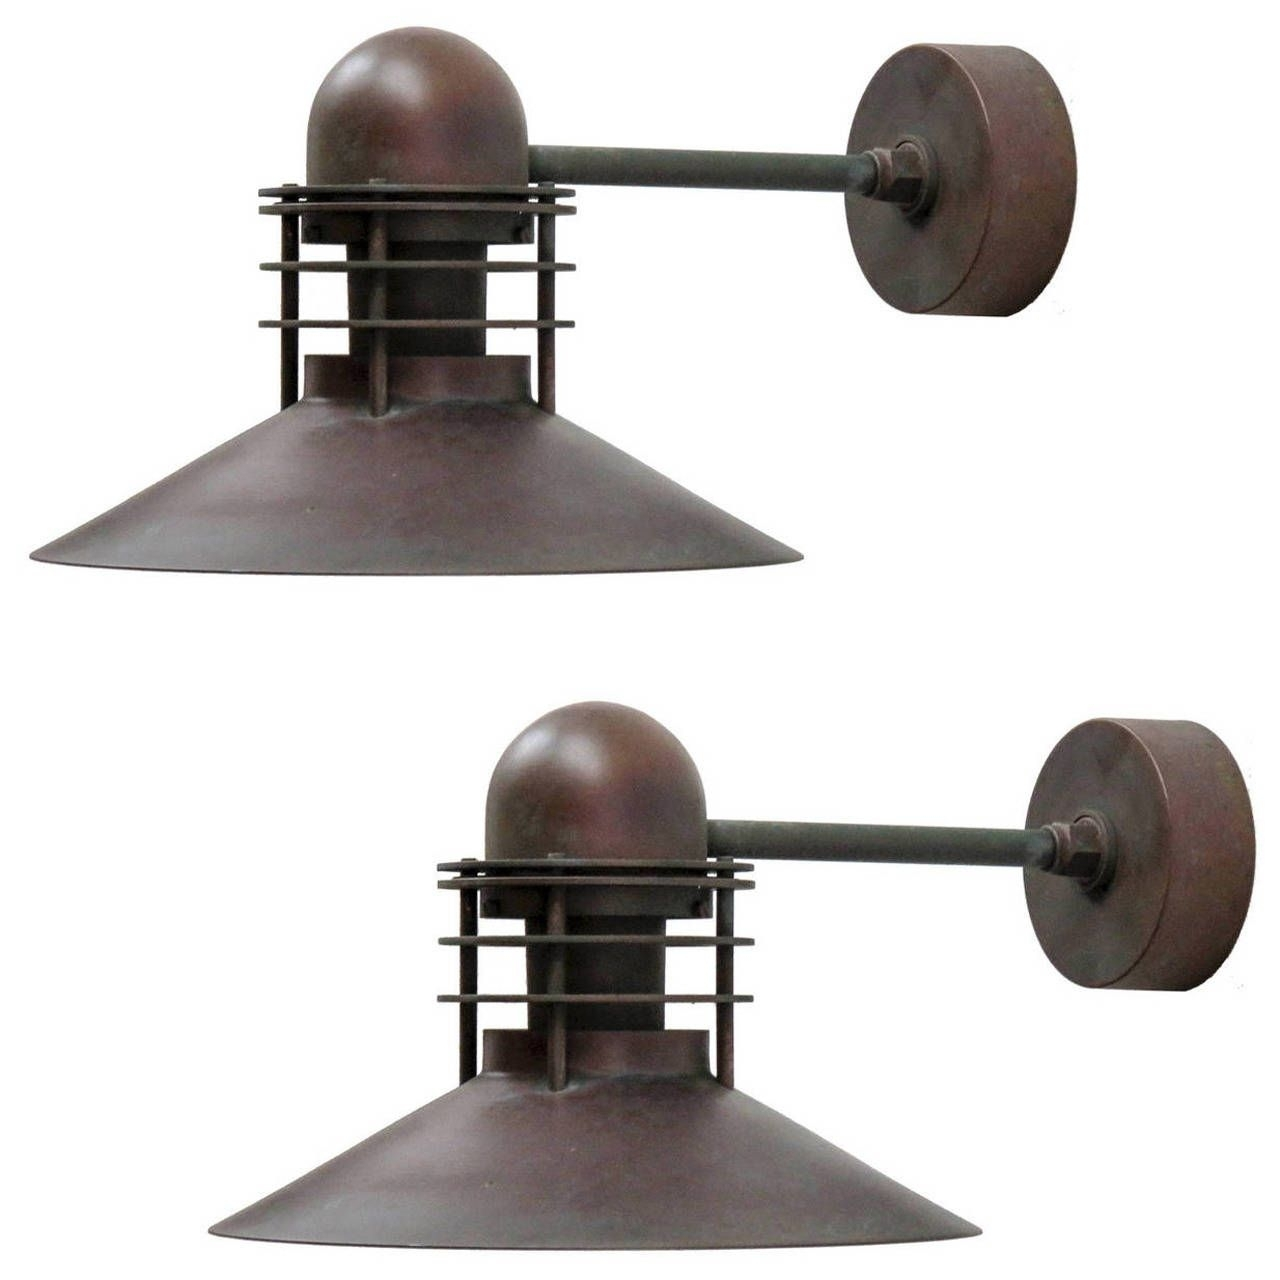 Louis Poulsen Copper Outdoor Lamps | Modern Wall, Lights And Modern Inside Beach Outdoor Wall Lighting (#9 of 15)